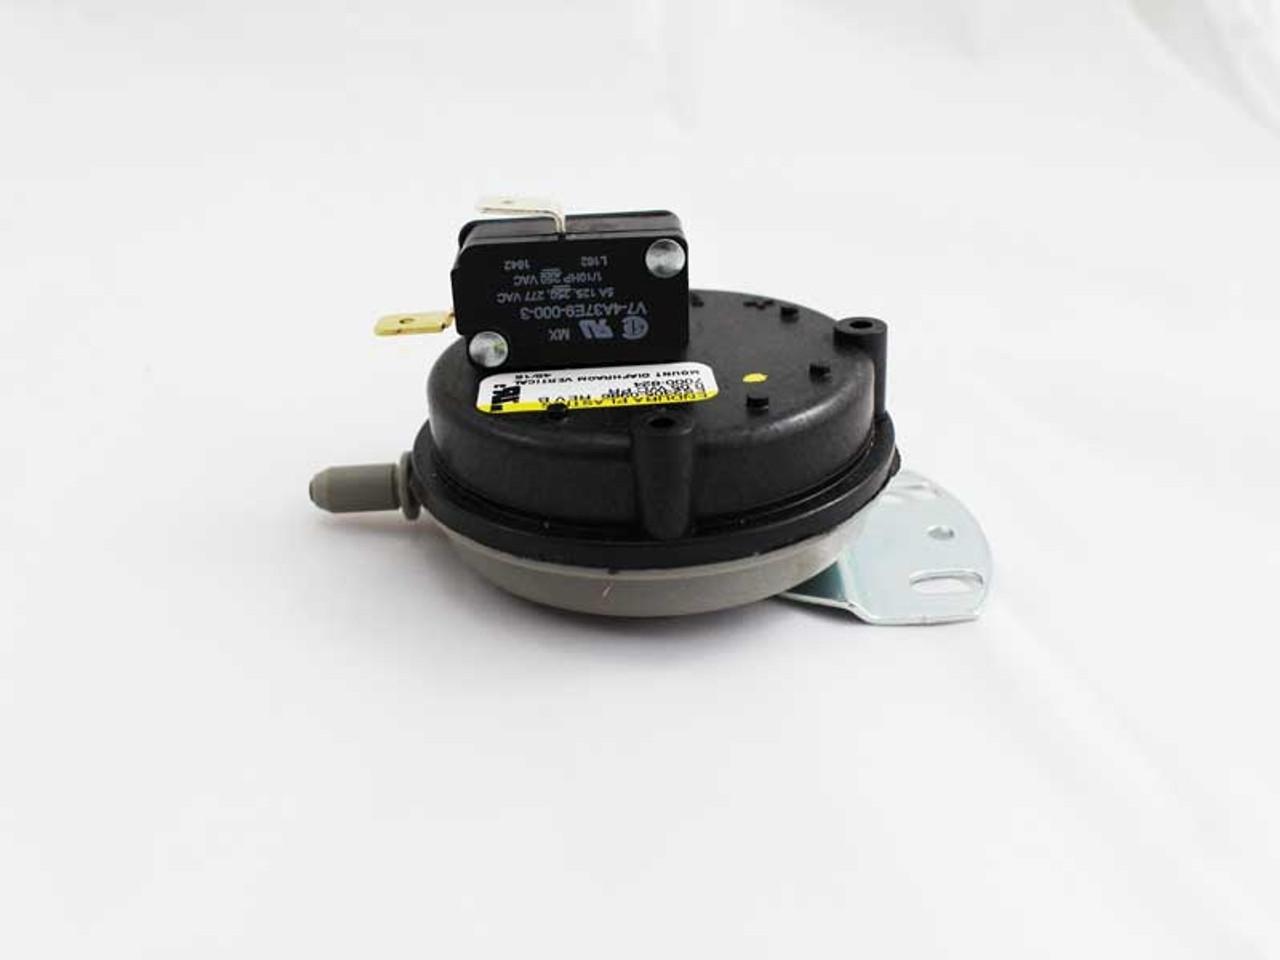 Vacuum Switch For Glow Boy Pellet Stoves KS 5090 1300